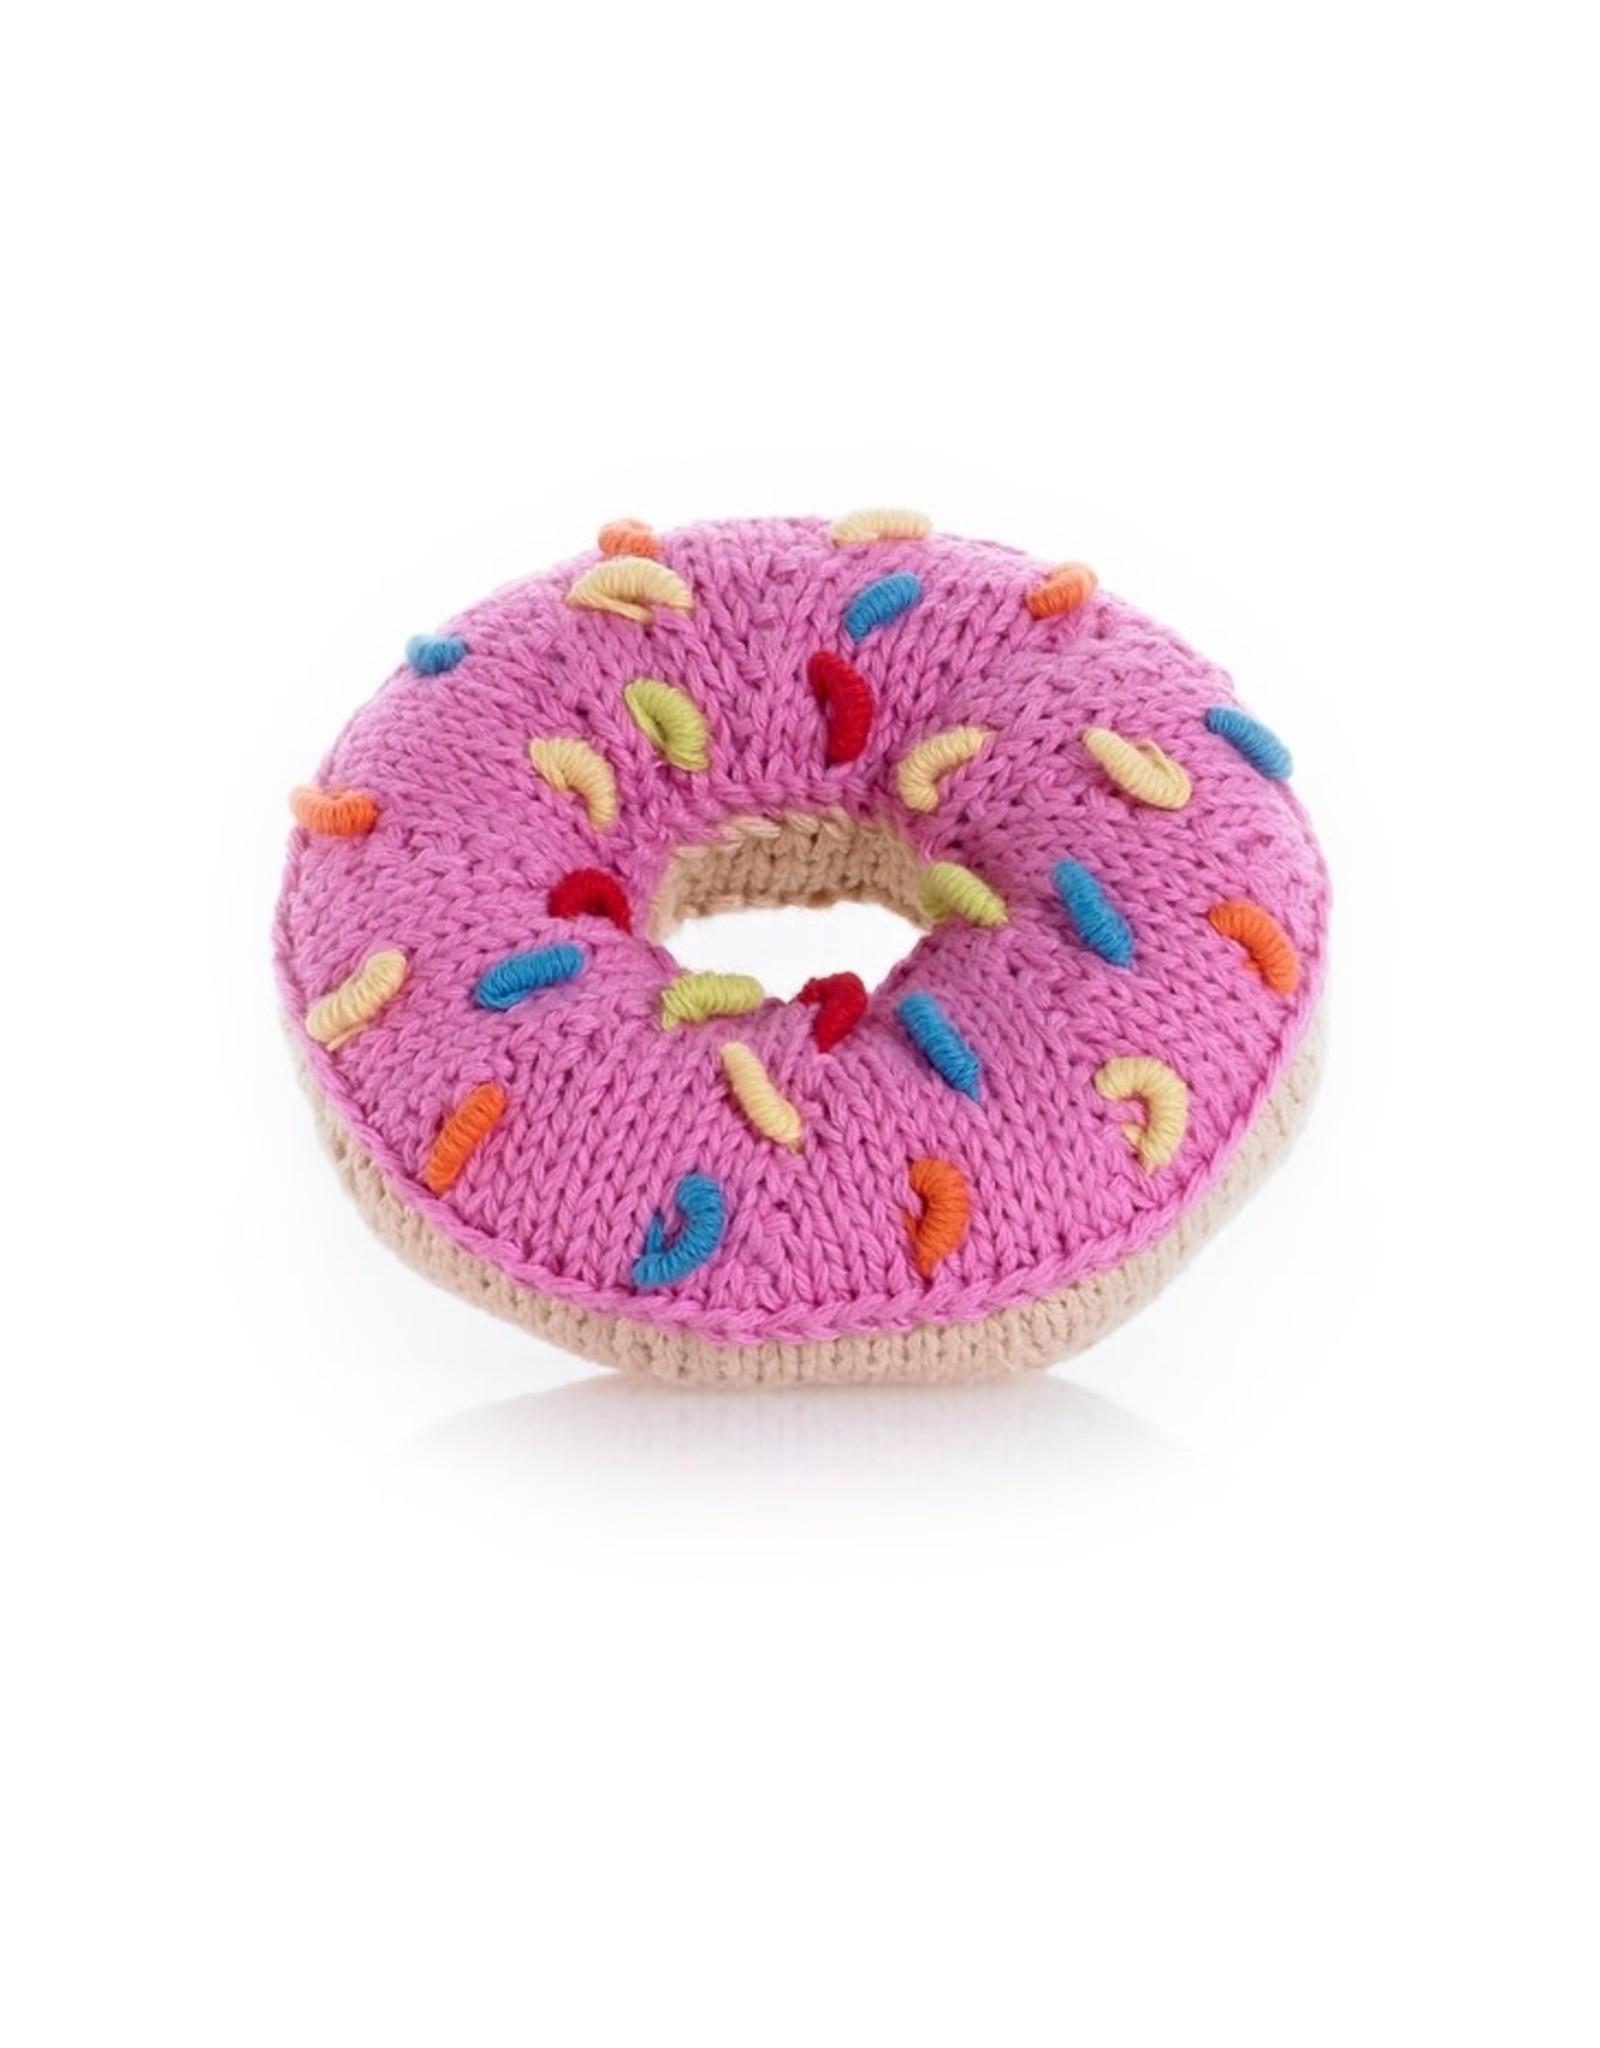 Pebble Donut Rattle, Bangladesh